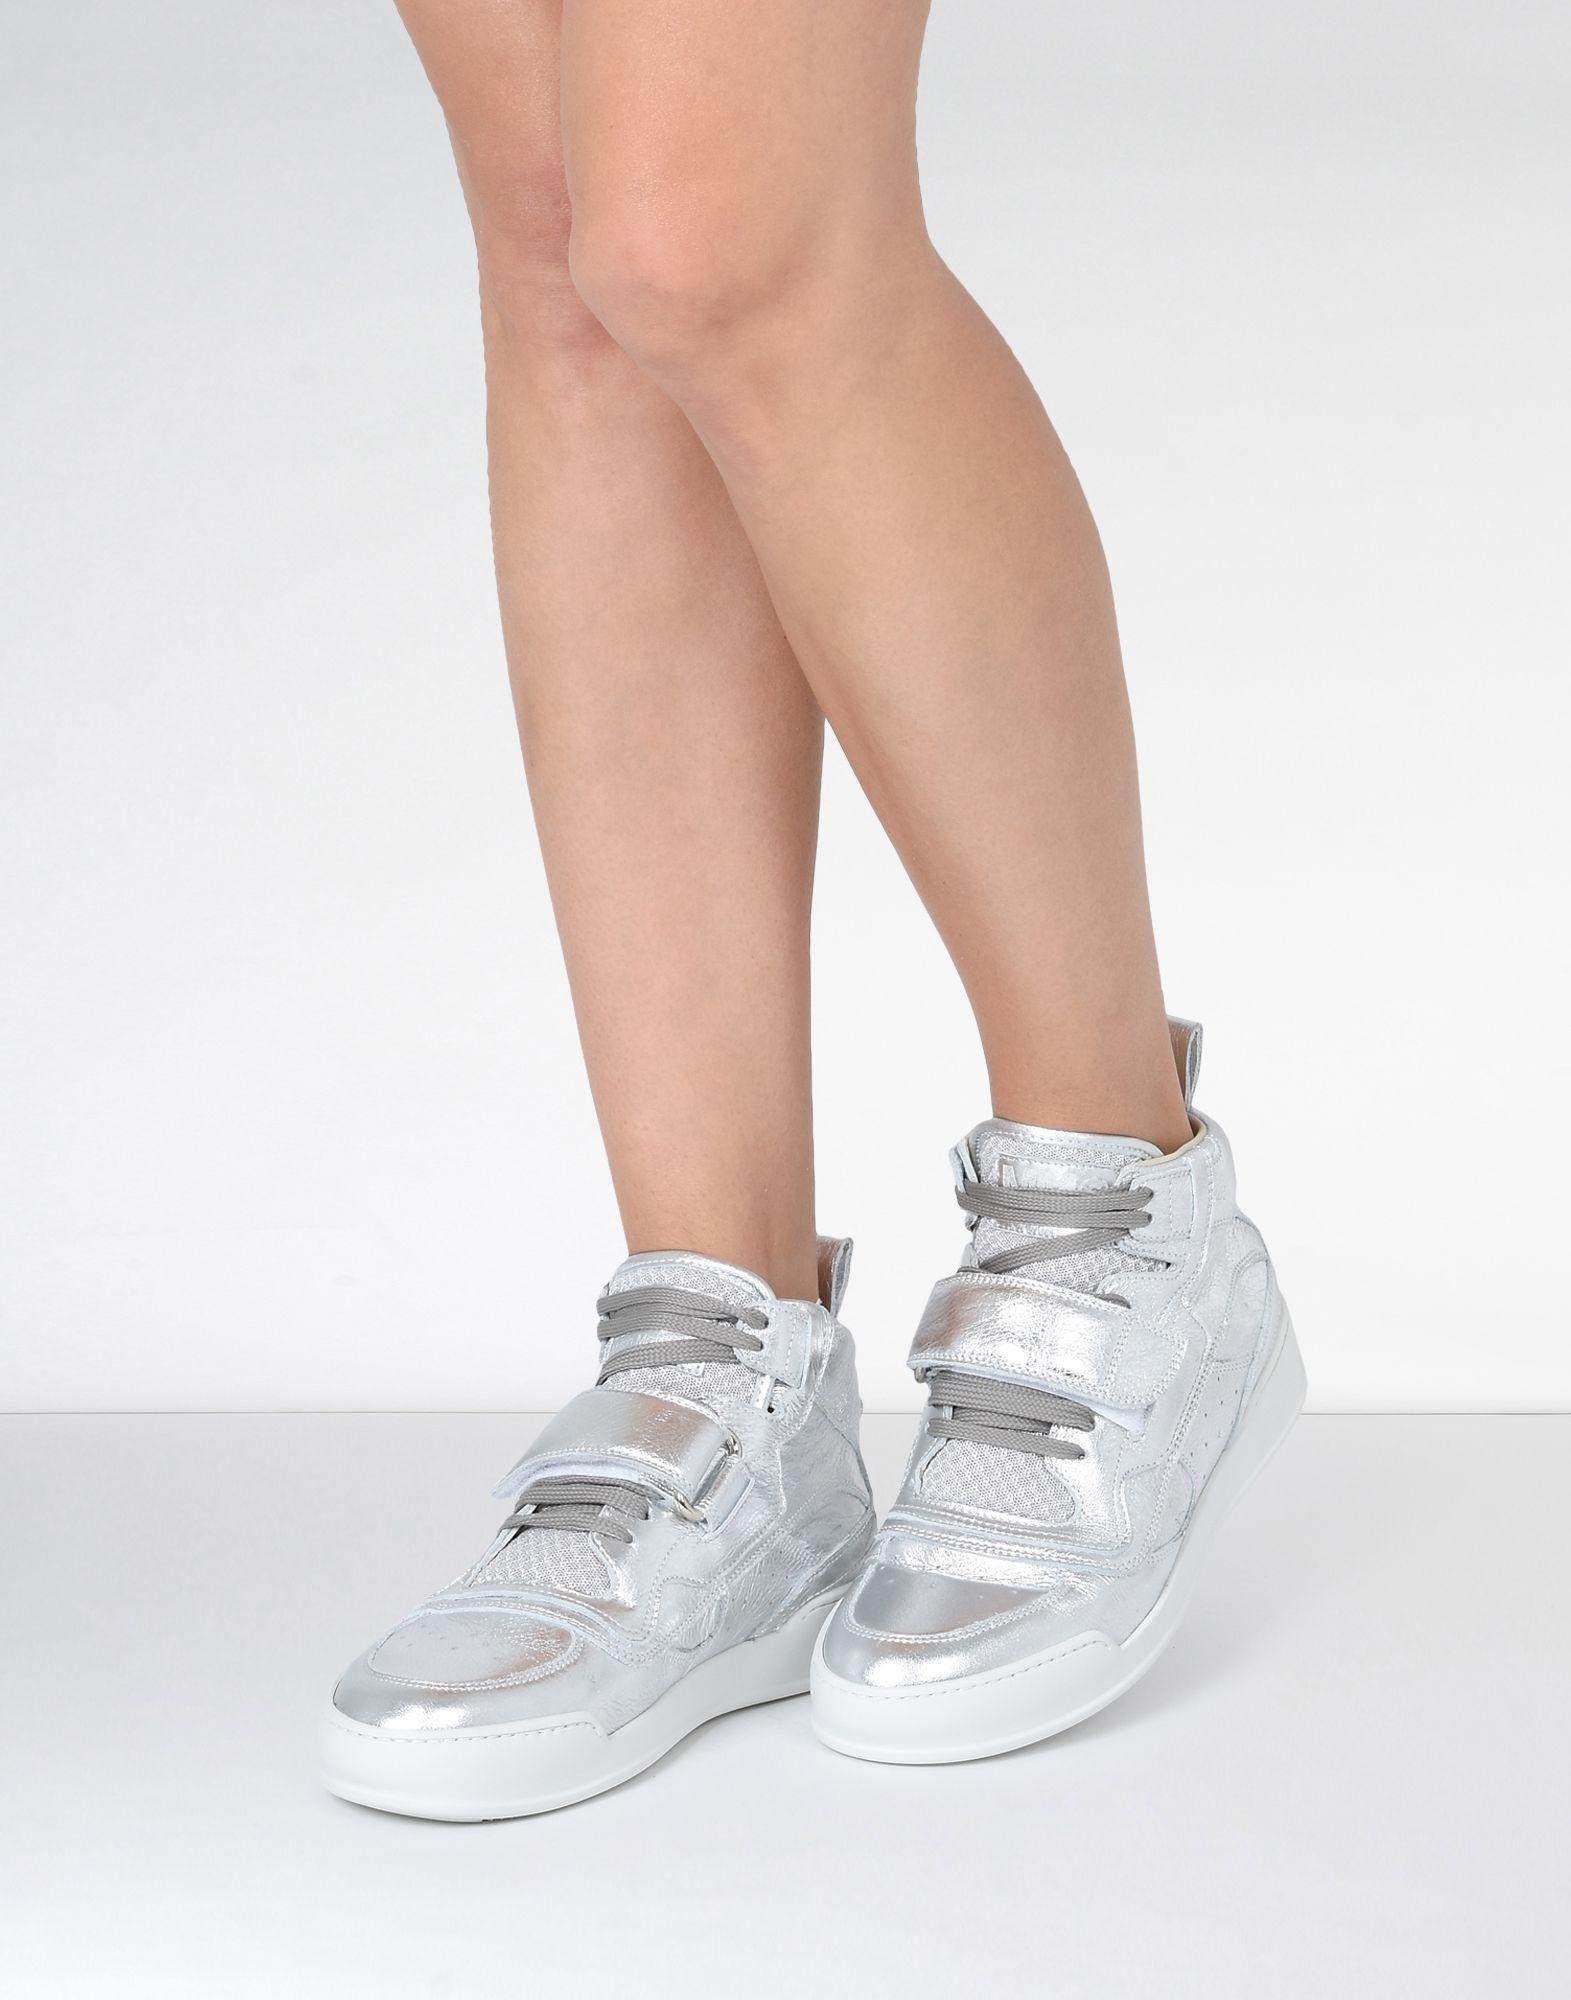 MM6 by Maison Martin Margiela Leather High Top Metallic Calfskin Sneakers